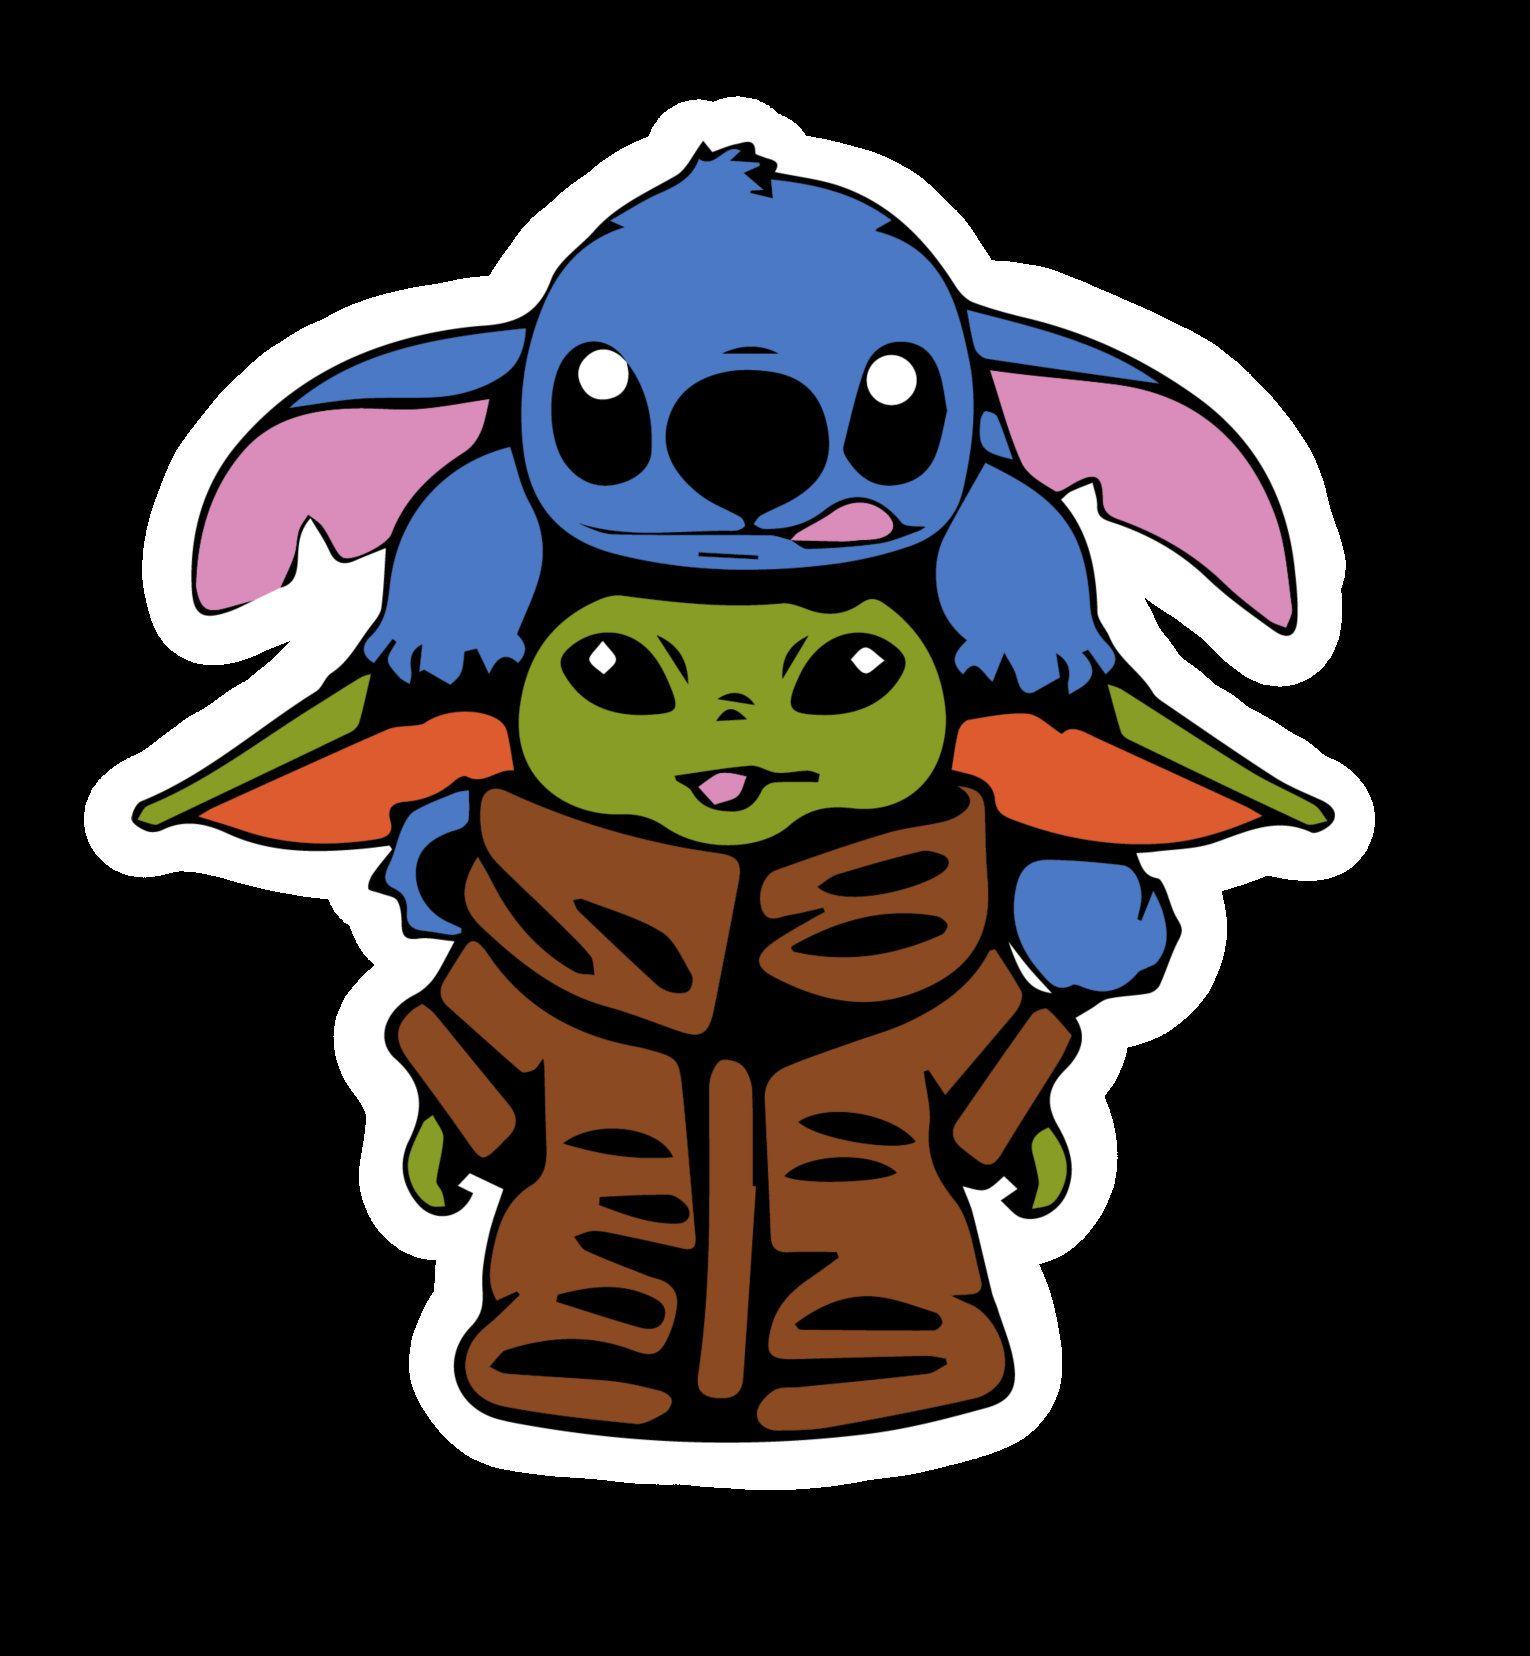 Baby Yoda And Stitch Inspired Disney Vinyl Waterproof Sticker Birthdaygifts Bumperstickers Babyyodas Cute Cartoon Drawings Yoda Sticker Cute Disney Drawings